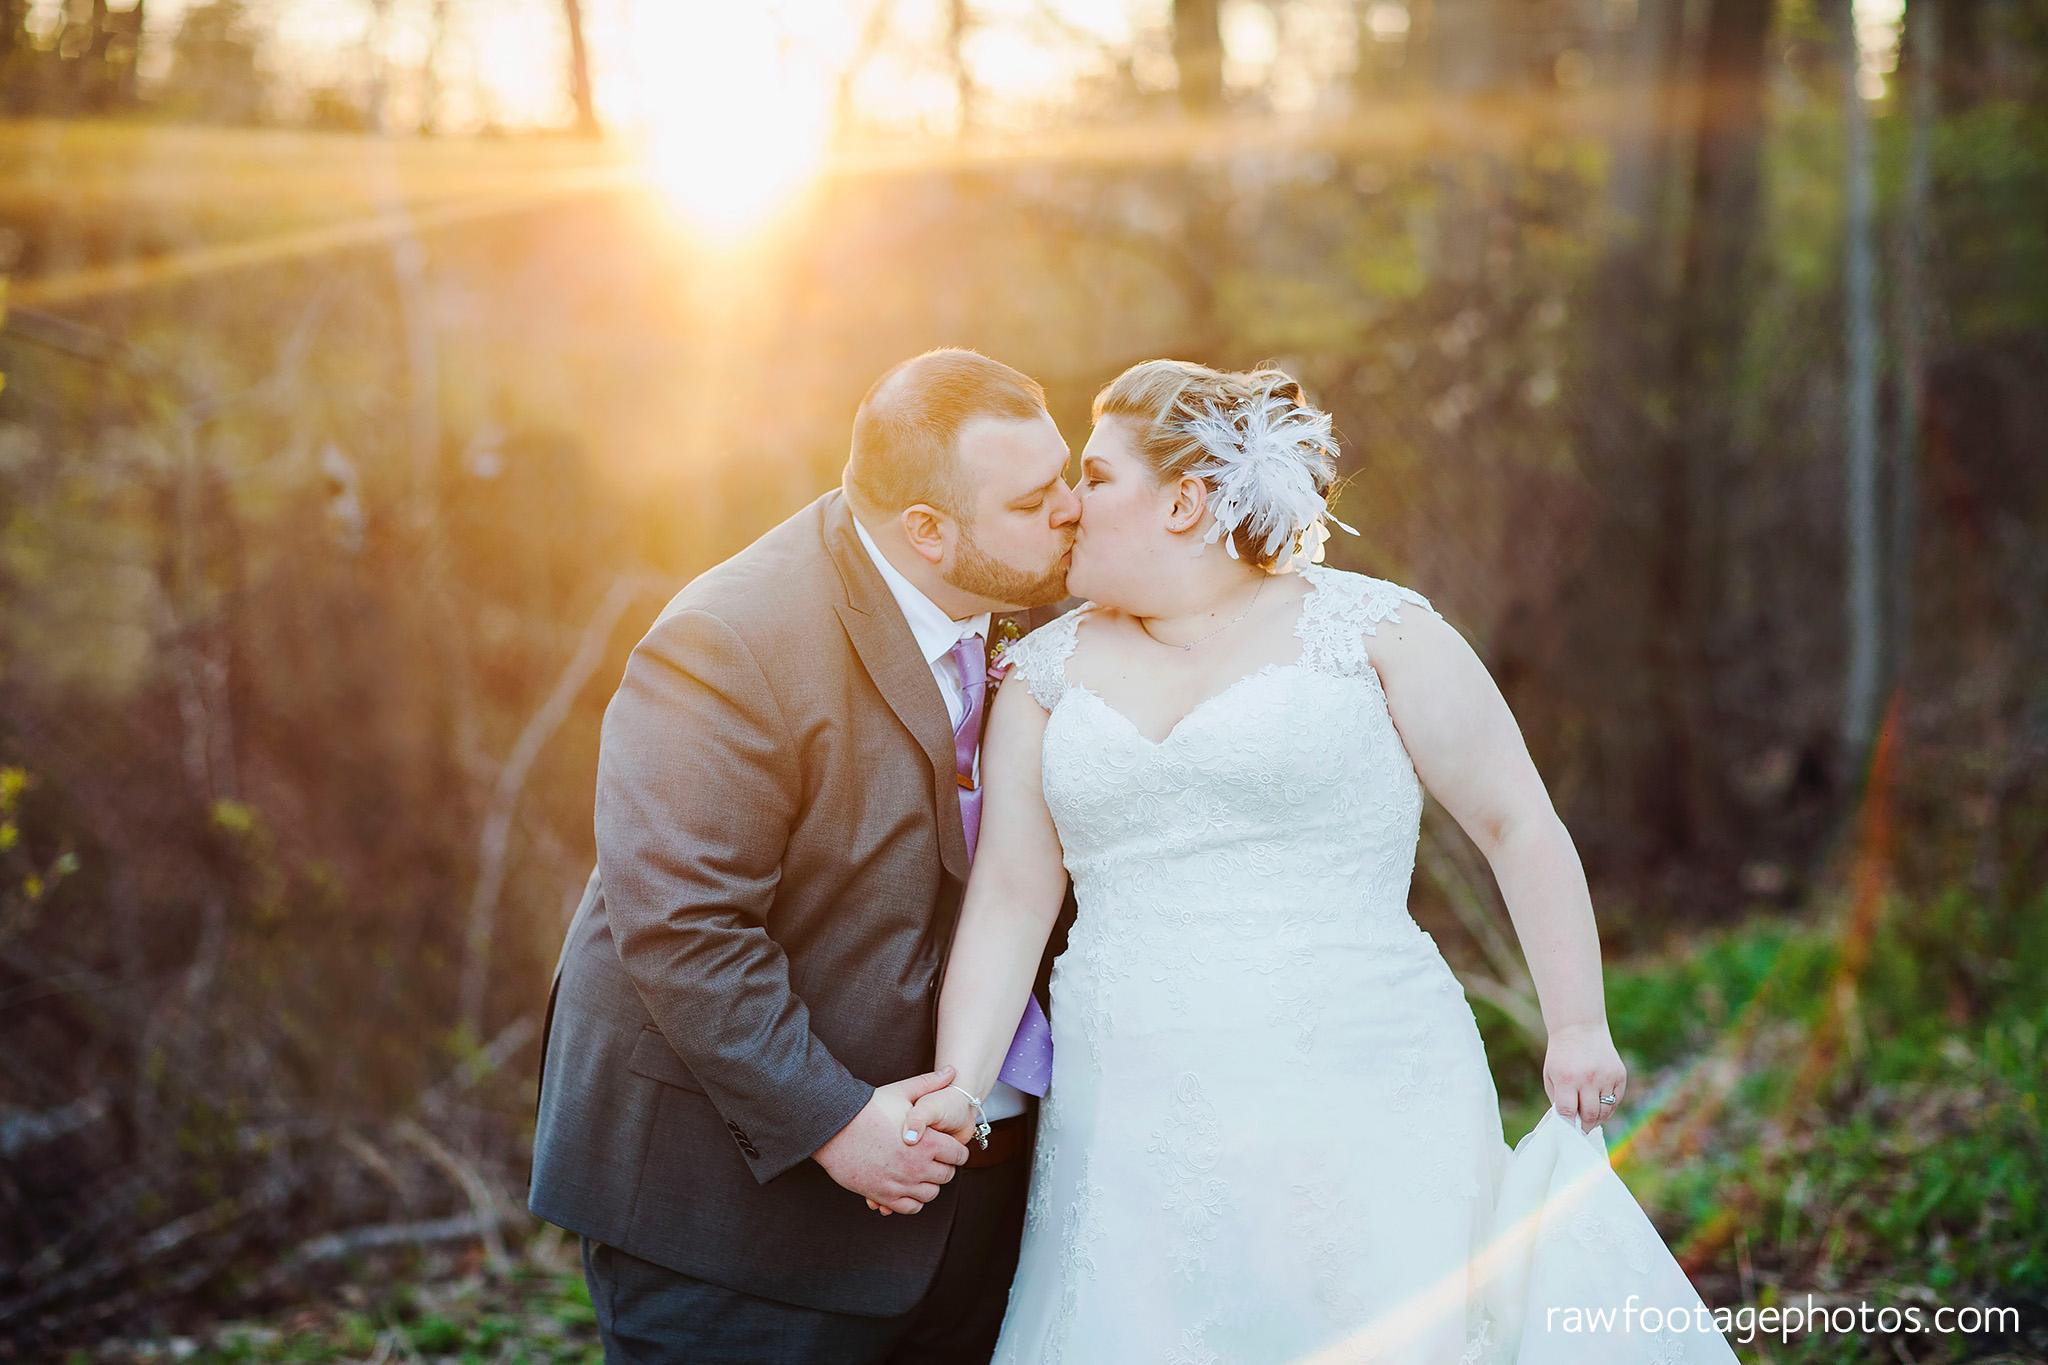 london_ontario_wedding_photographer-ivey_spencer_leadership_centre-raw_footage_photography-blue_jays_wedding051.jpg